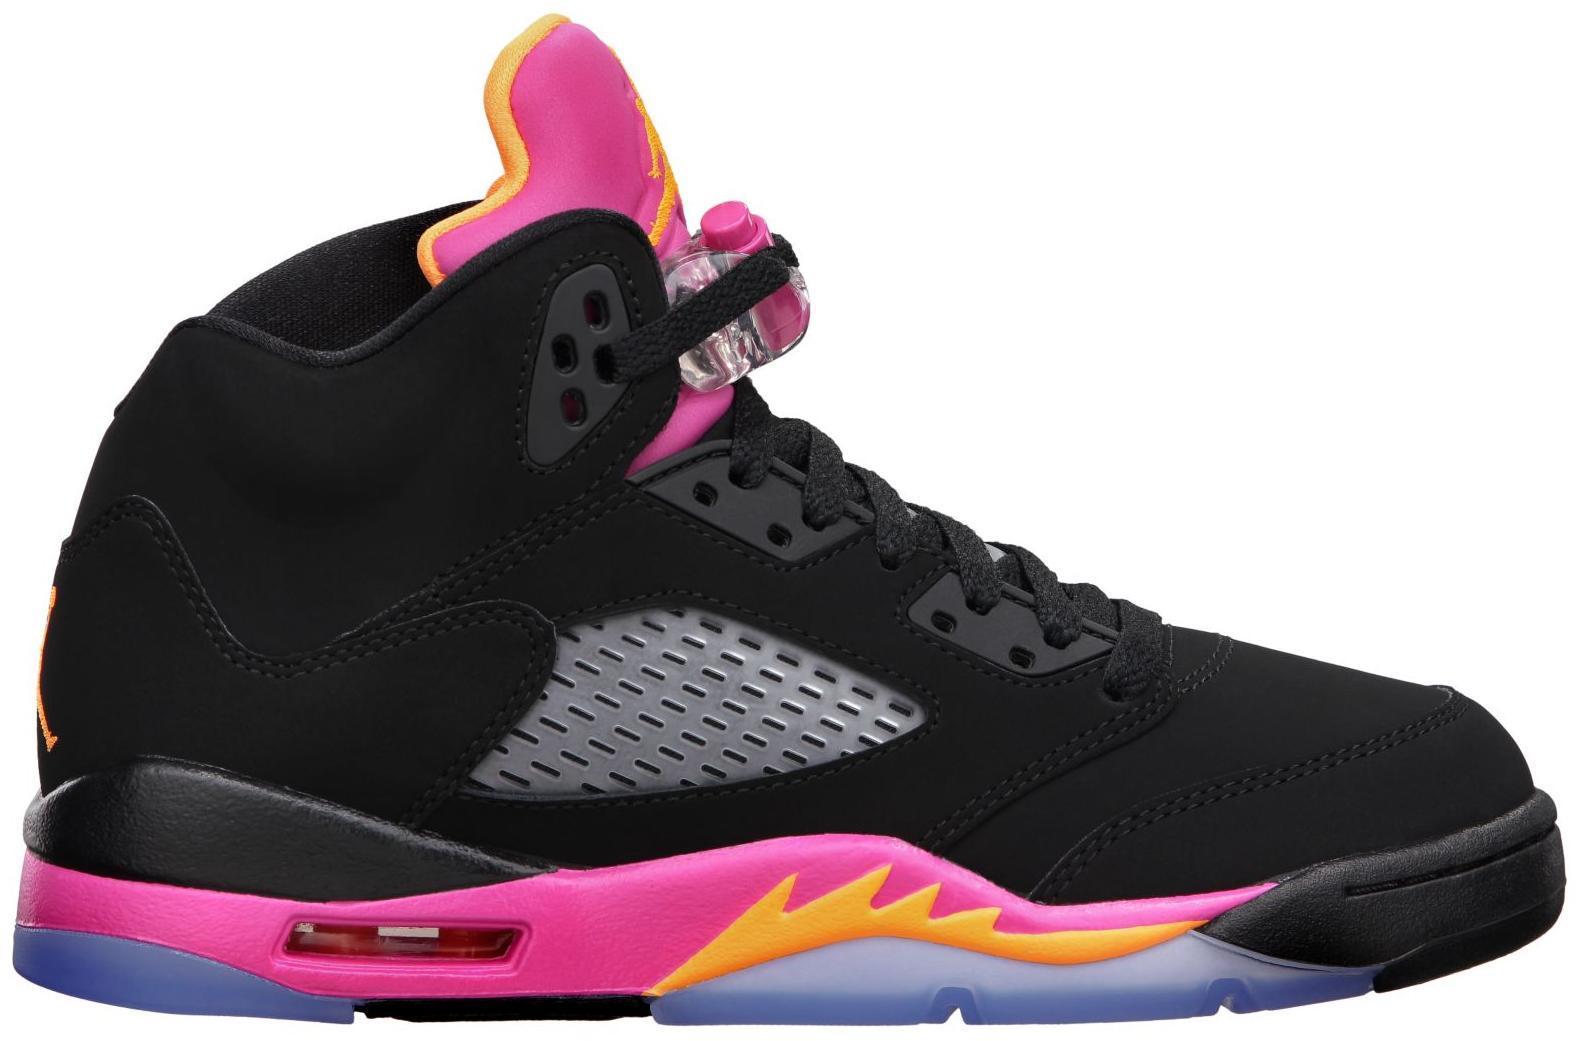 Jordan 5 Retro Black Pink (GS)